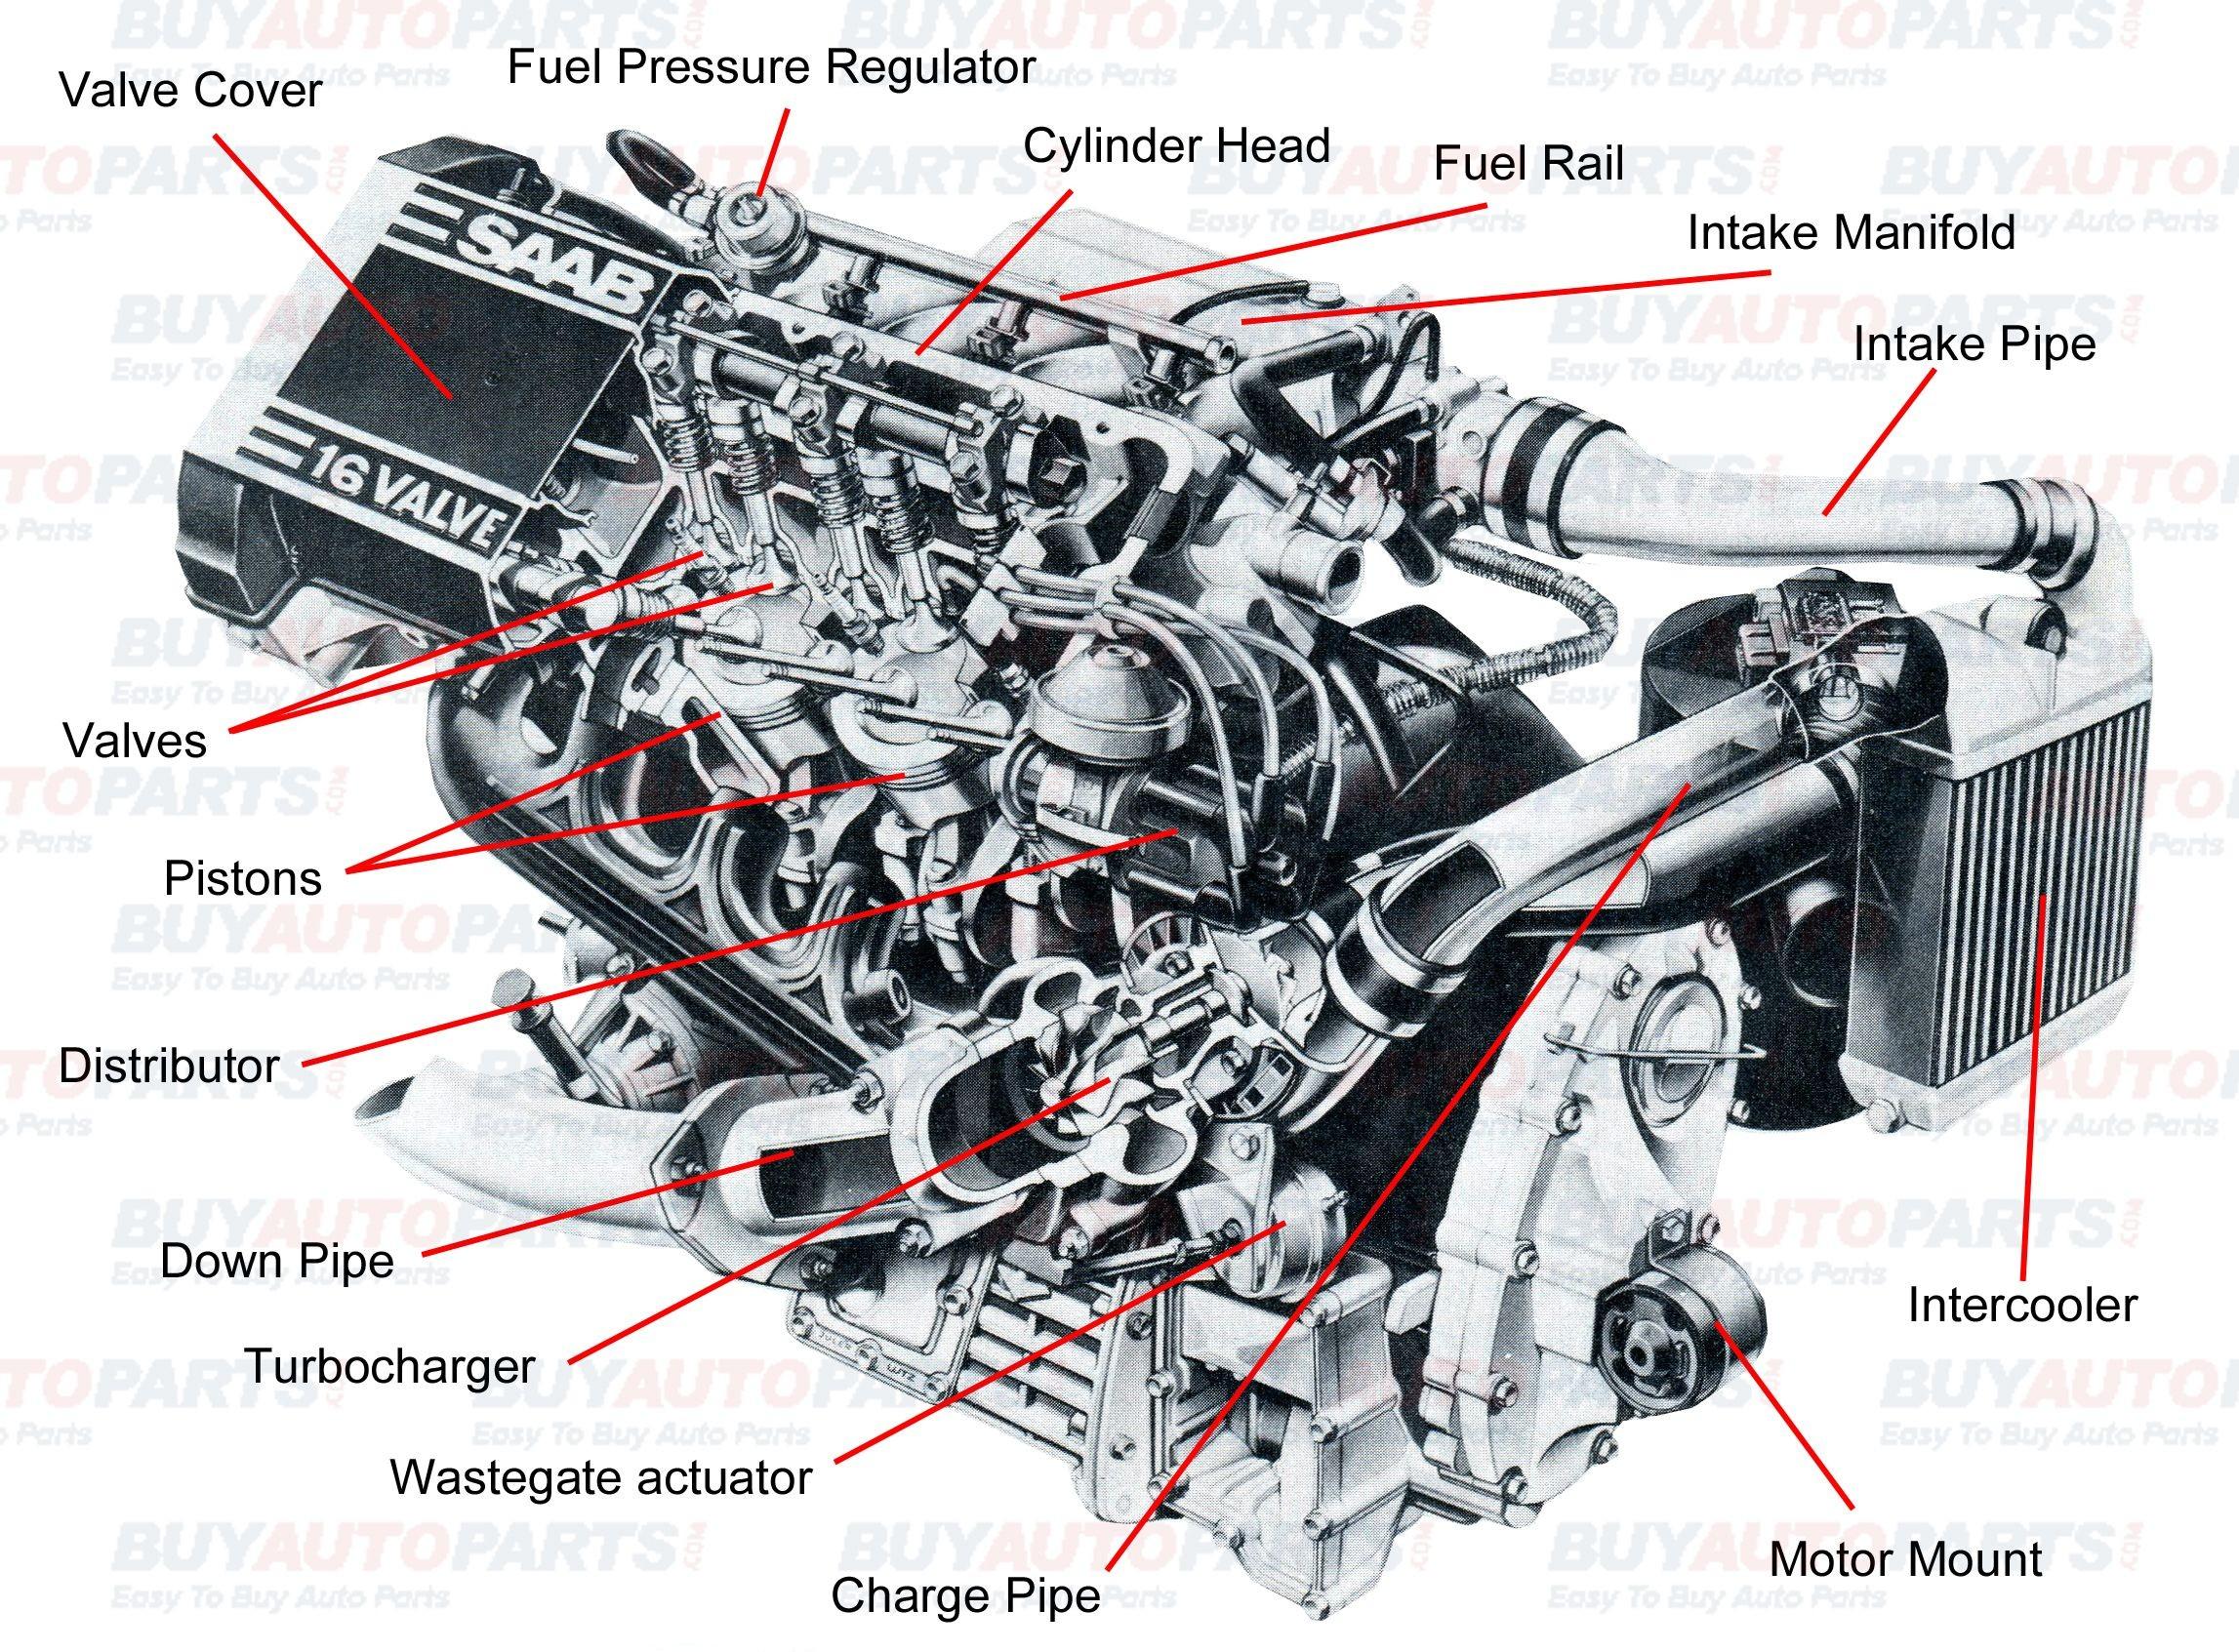 Diagram Of Car Components Porsche 944 Engine Oil Flow All Internal Bustion Engines Have The Same Basic Ponents